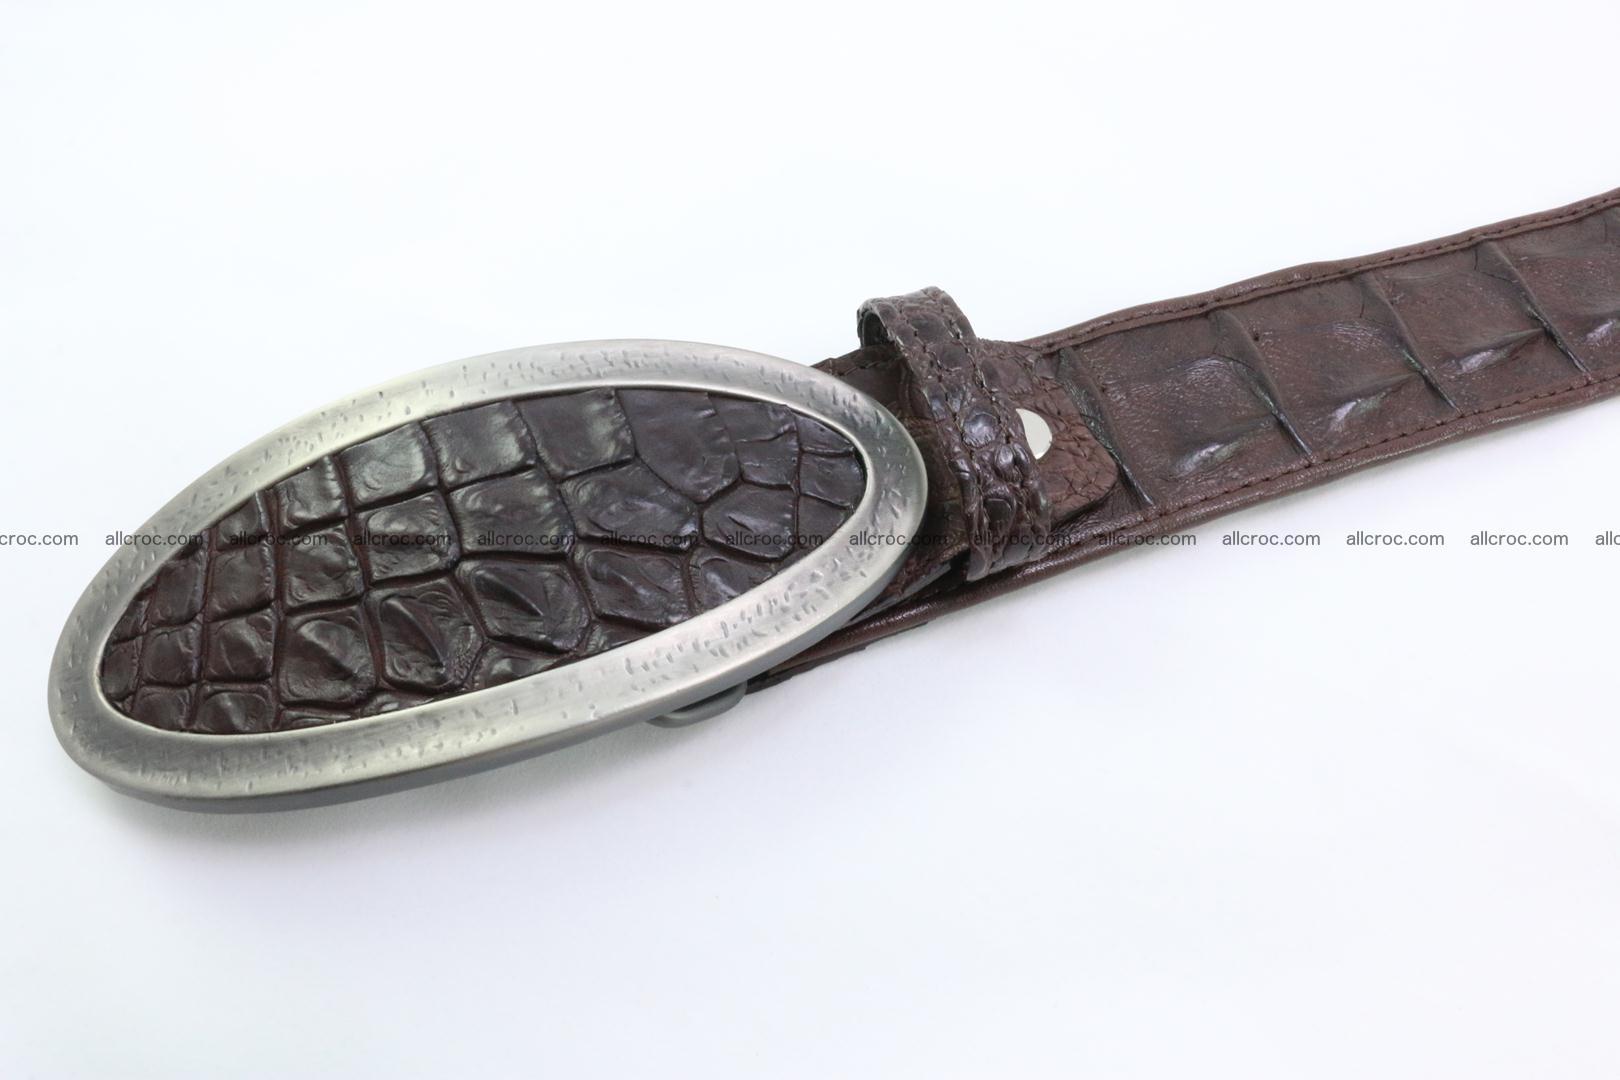 Genuine crocodile leather hornback belt 089 Foto 1